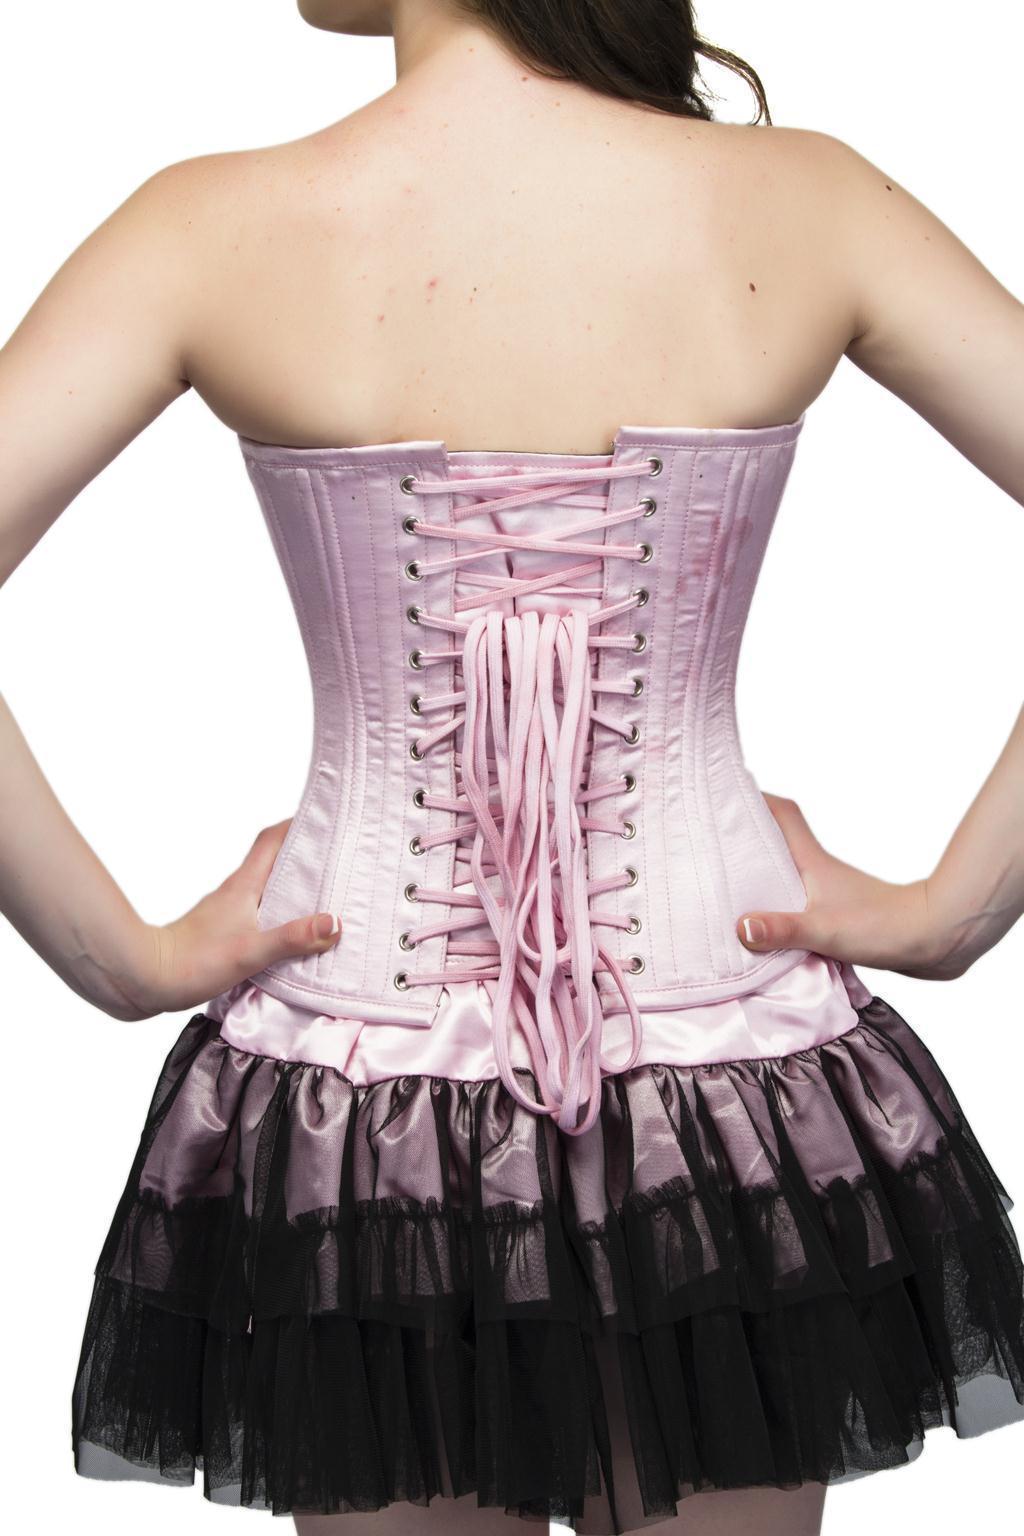 Baby Pink Satin Double Bone Overbust Top Tutu Skirt PLUS SIZE Corset Prom Dress